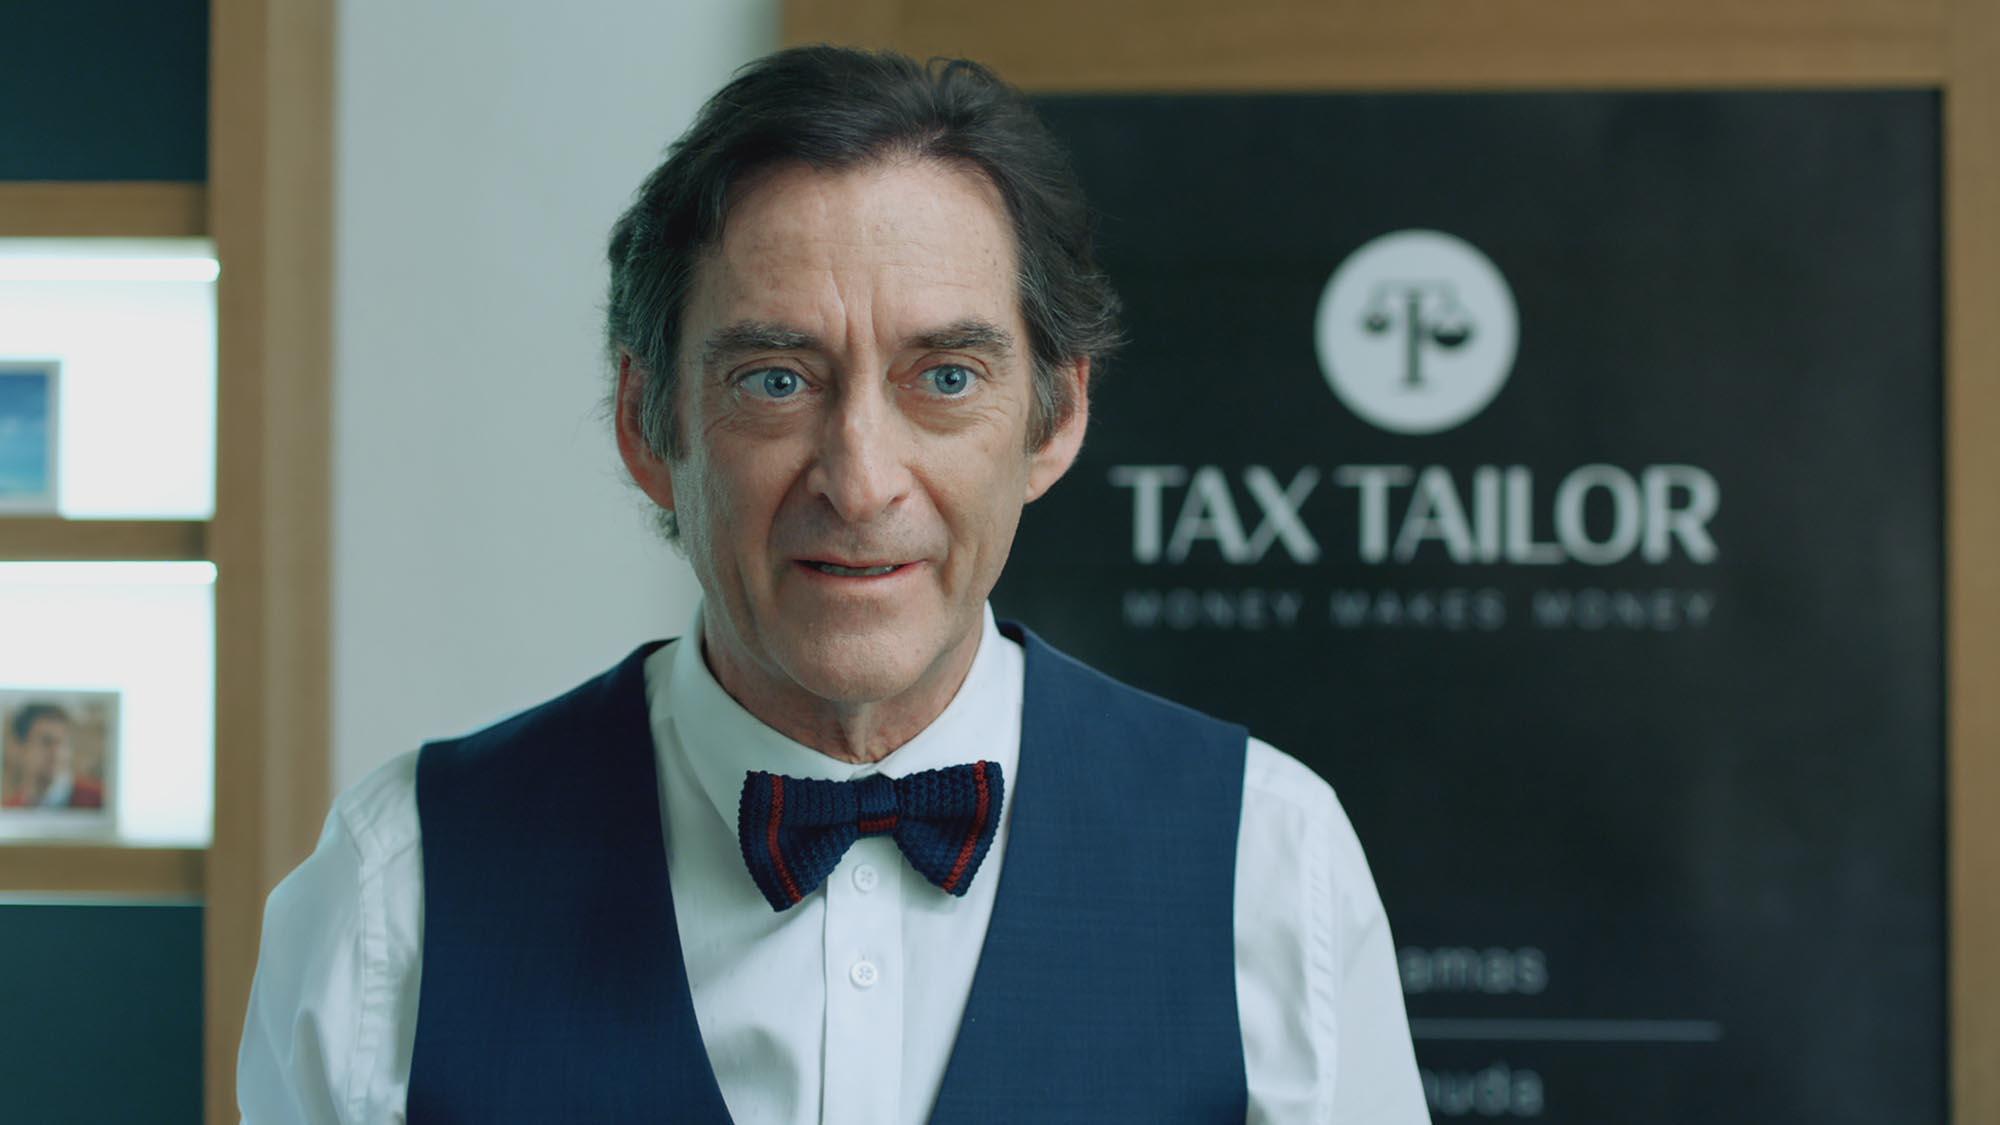 Tax Tailor